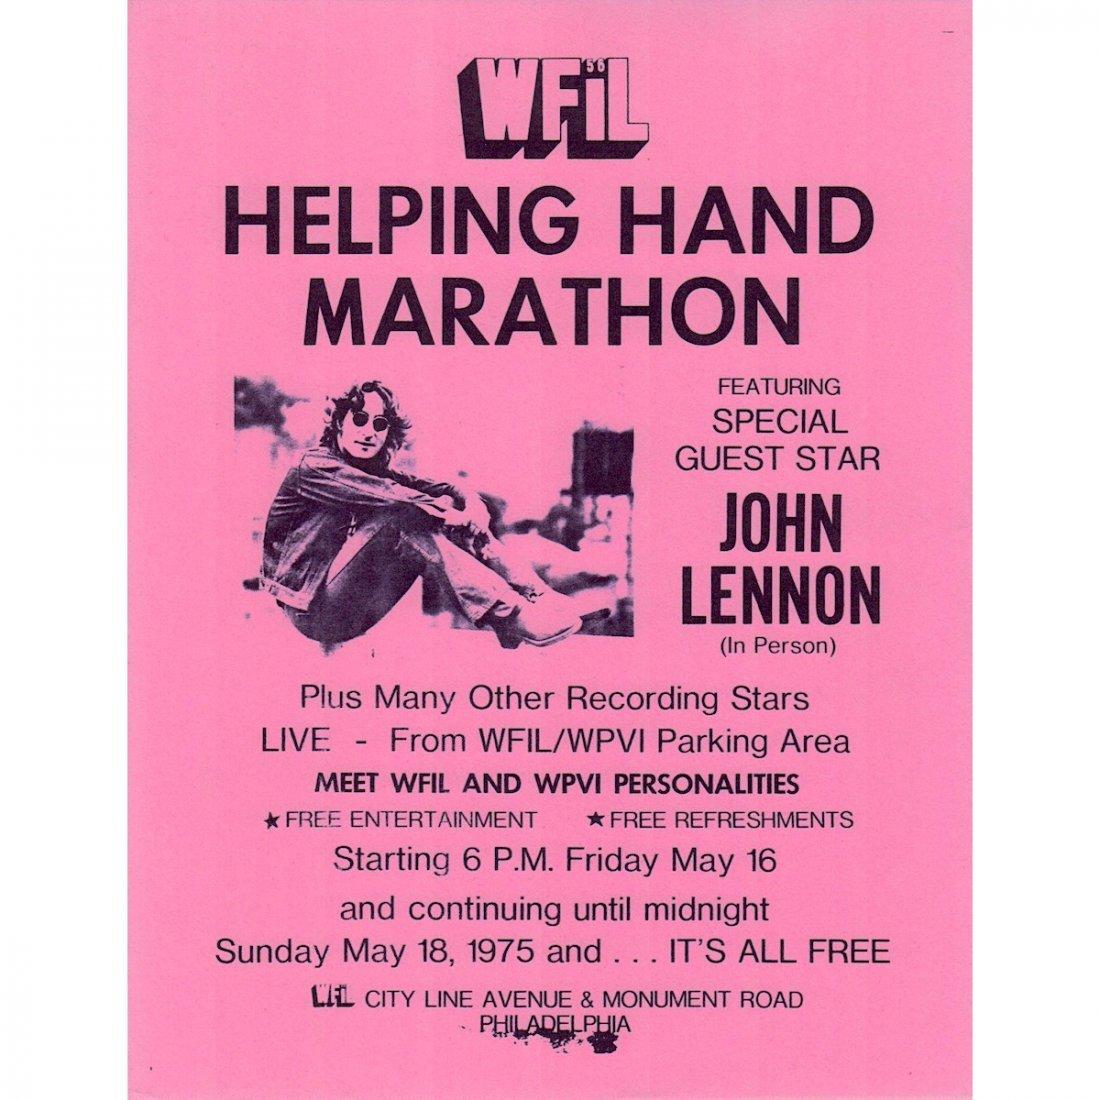 John Lennon - WFIL Helping Hand Marathon - 1975 Flyer